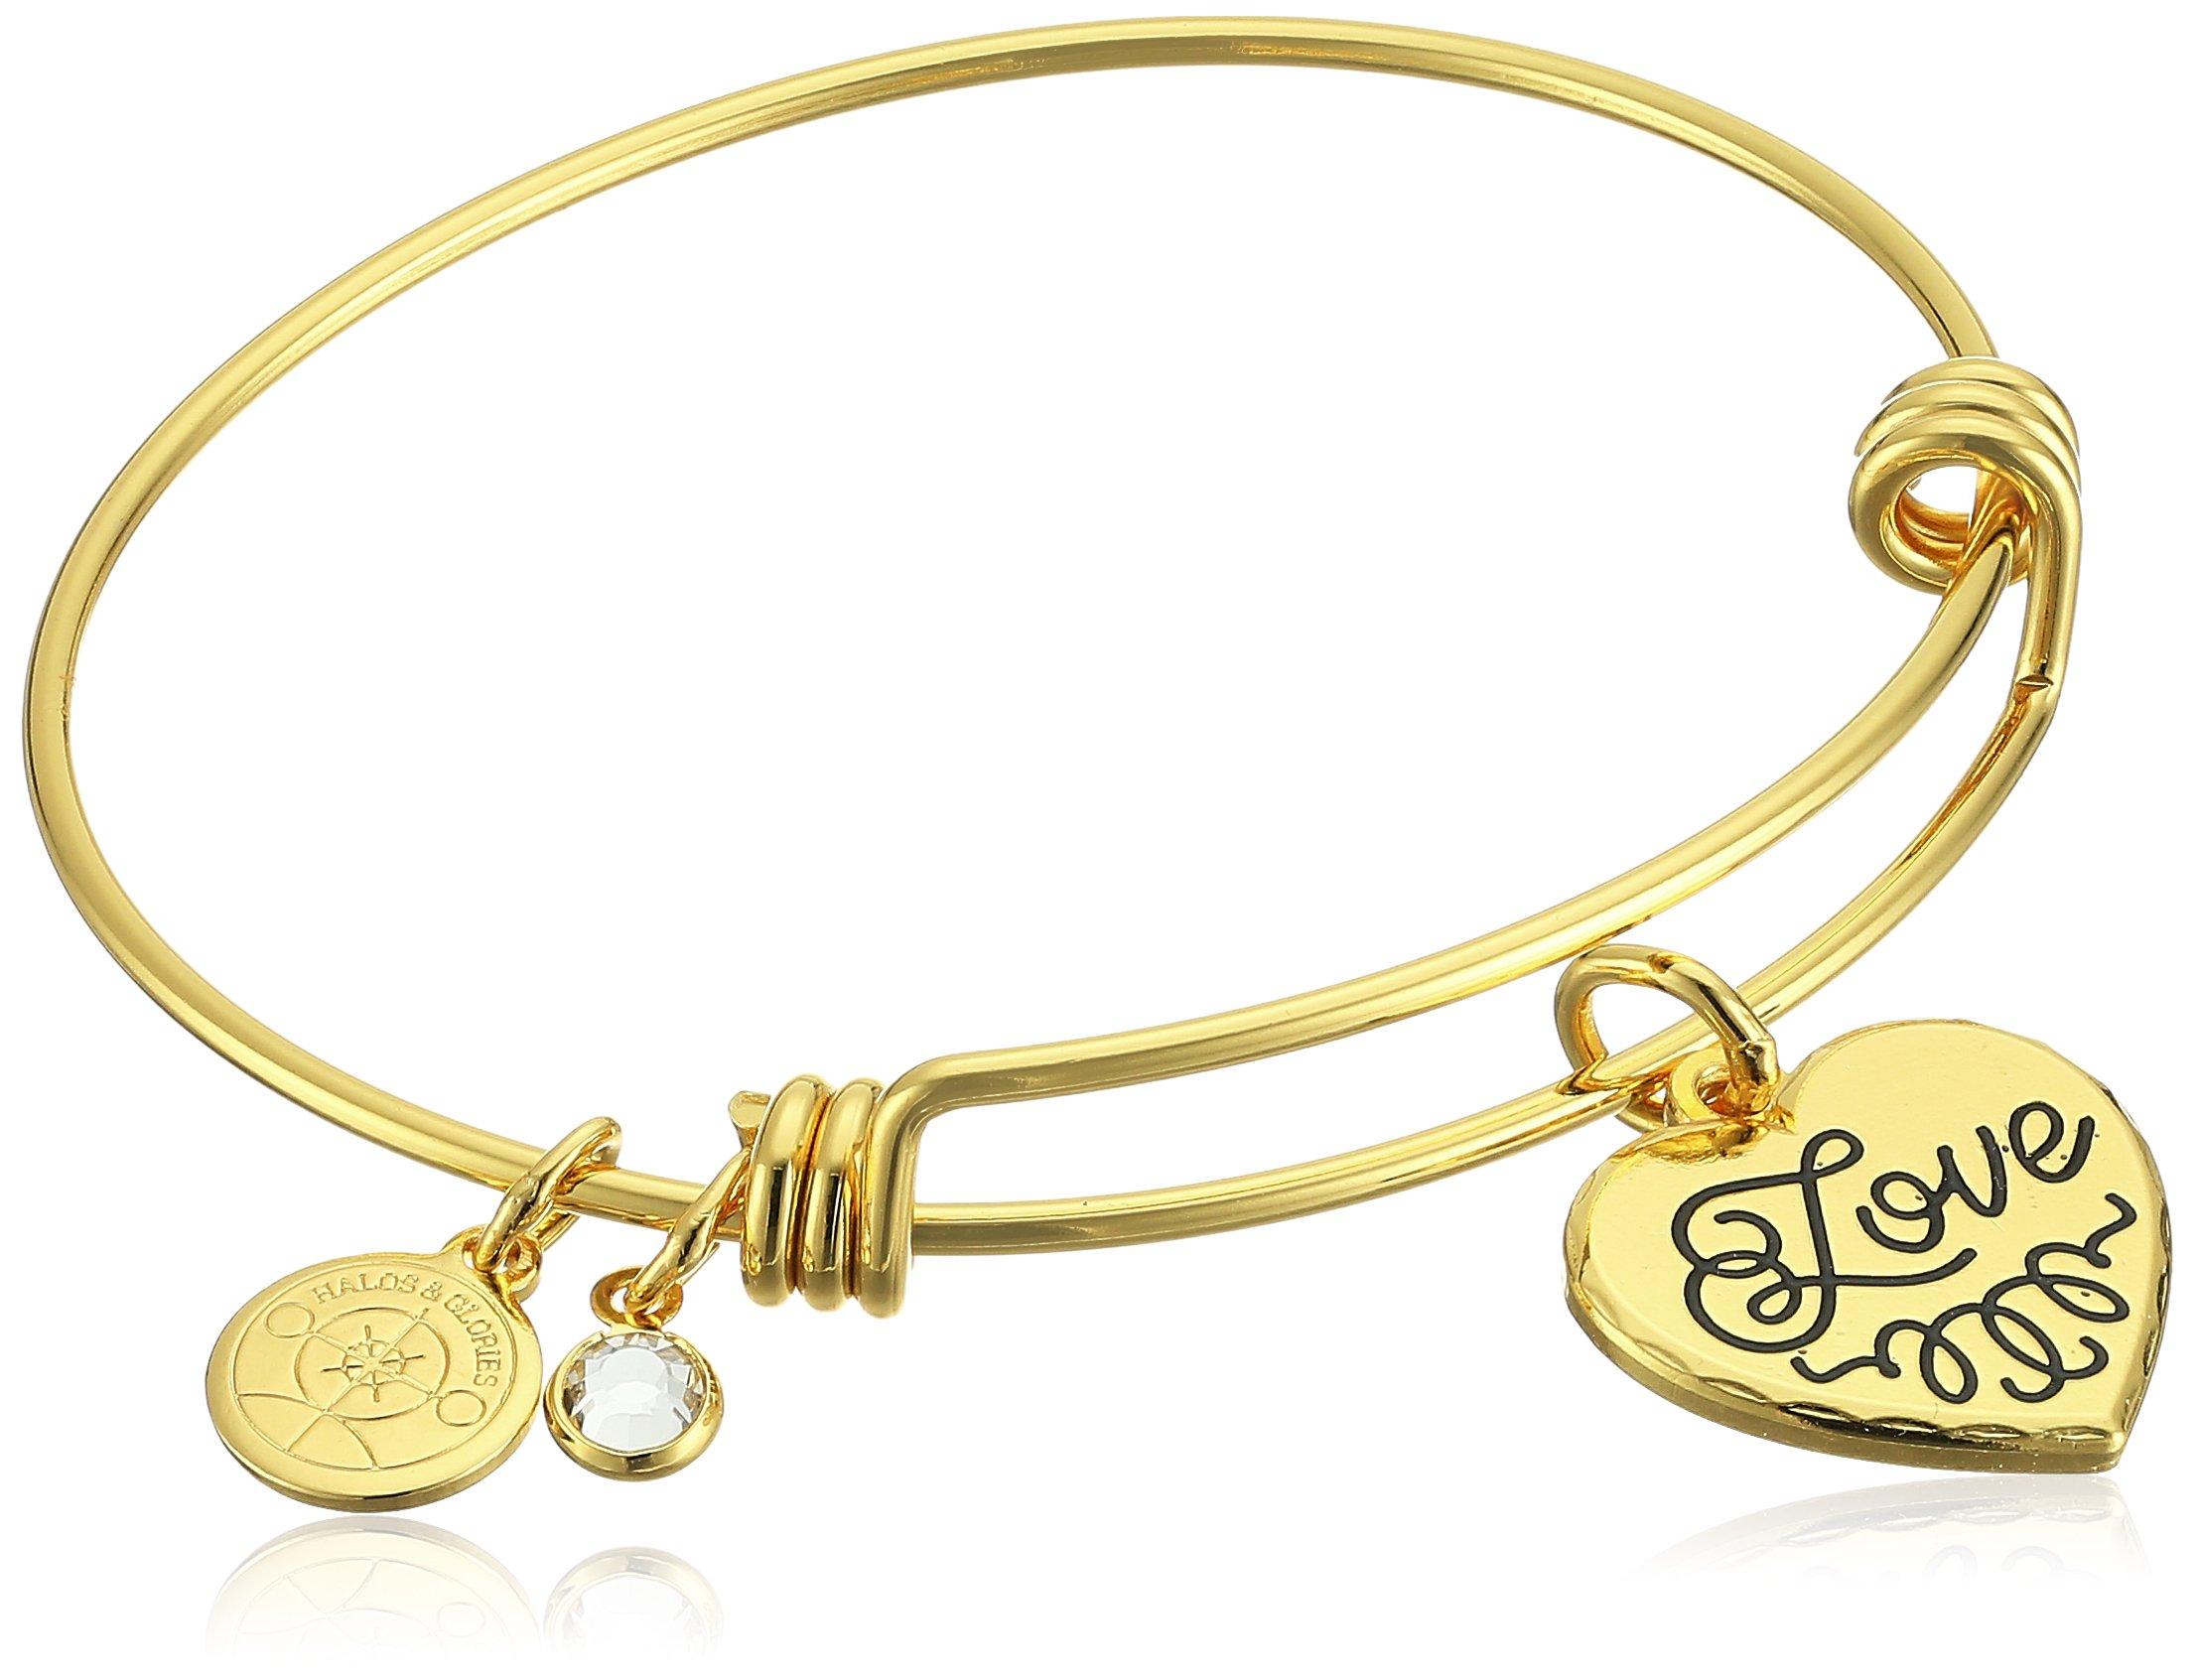 Halos & Glories Love Shiny Gold Bangle Bracelet